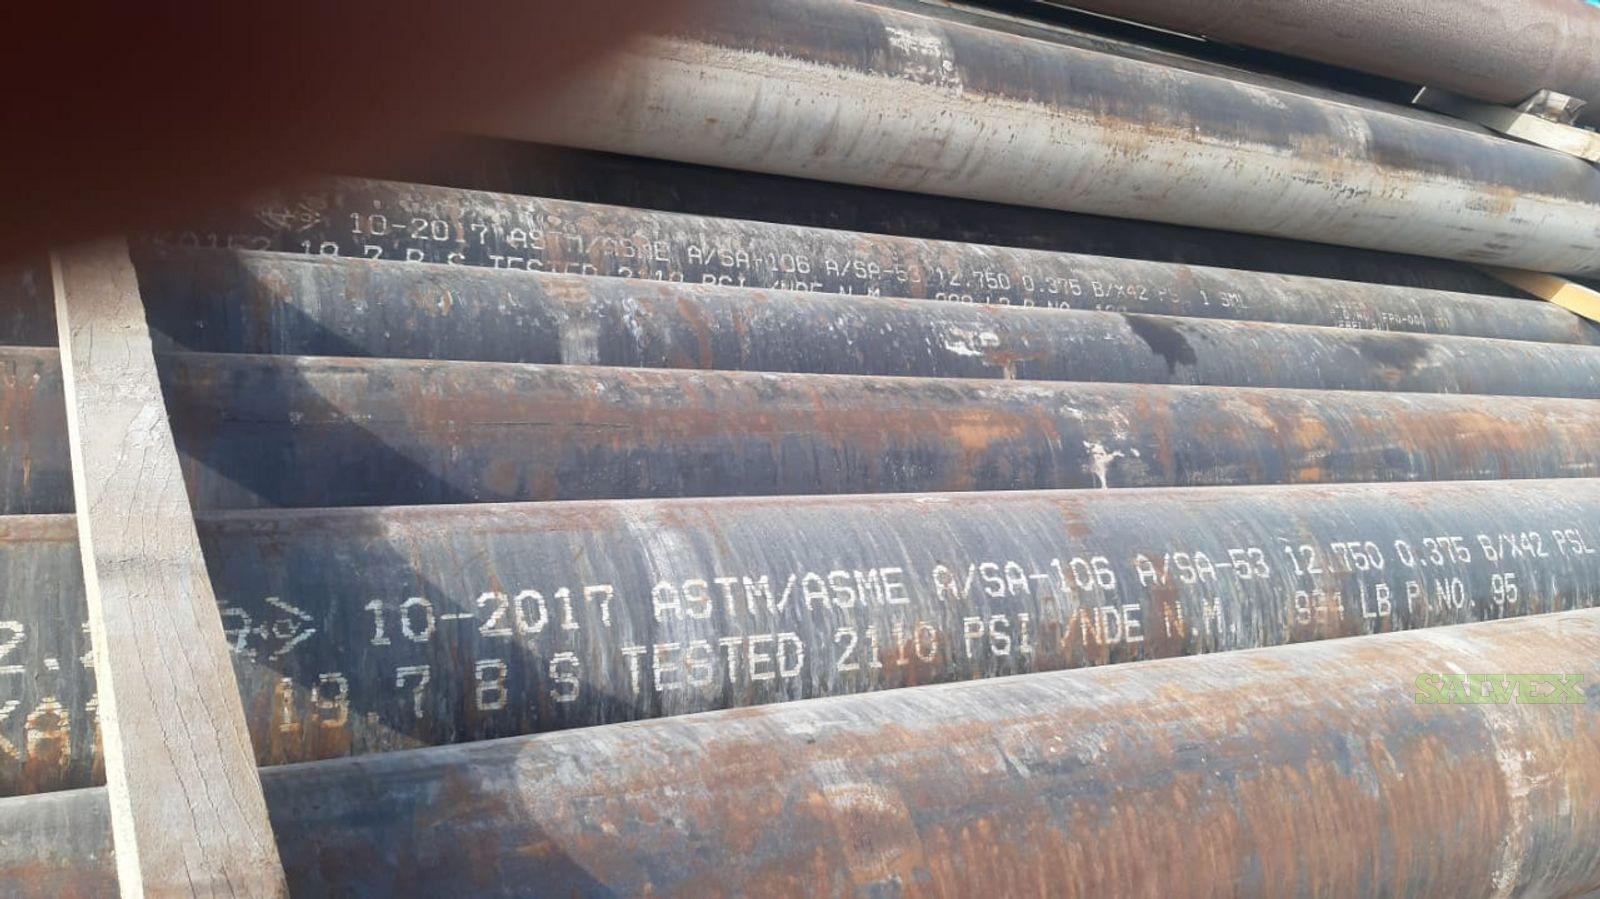 3/4 - 14 X42 SMLS Surplus Line Pipe (282 Metric Tons)